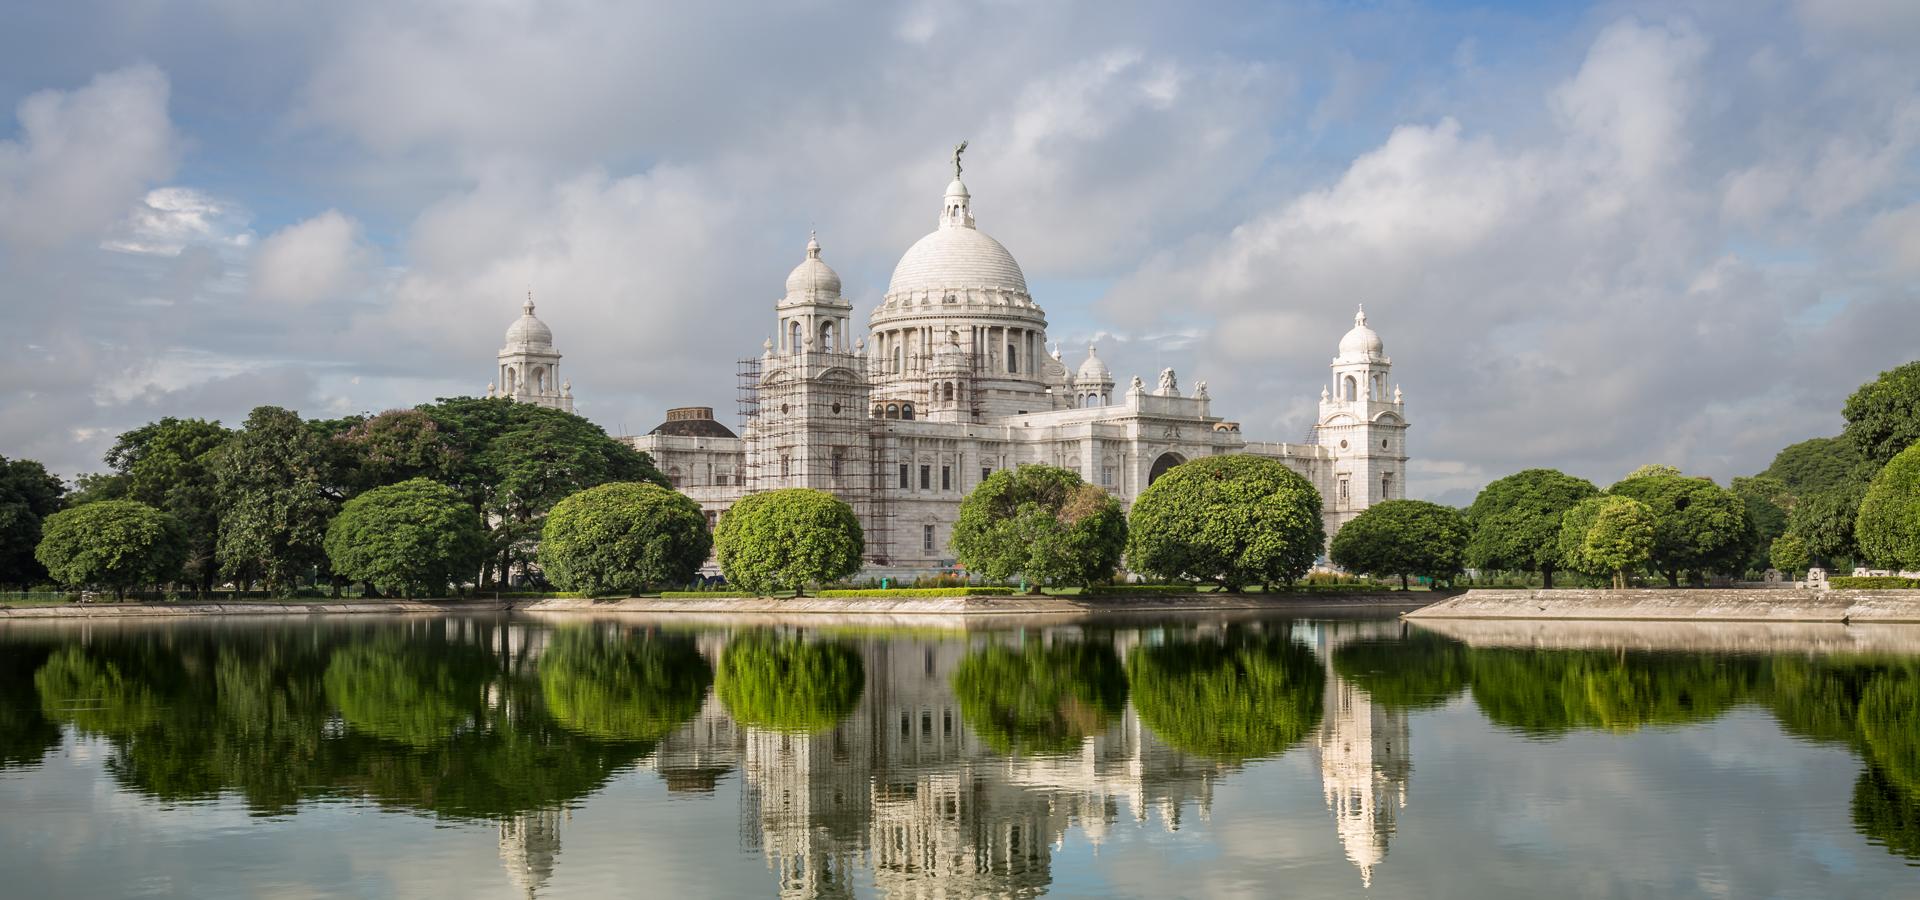 Peer-to-peer advisory in Kolkata, West Bengal, India